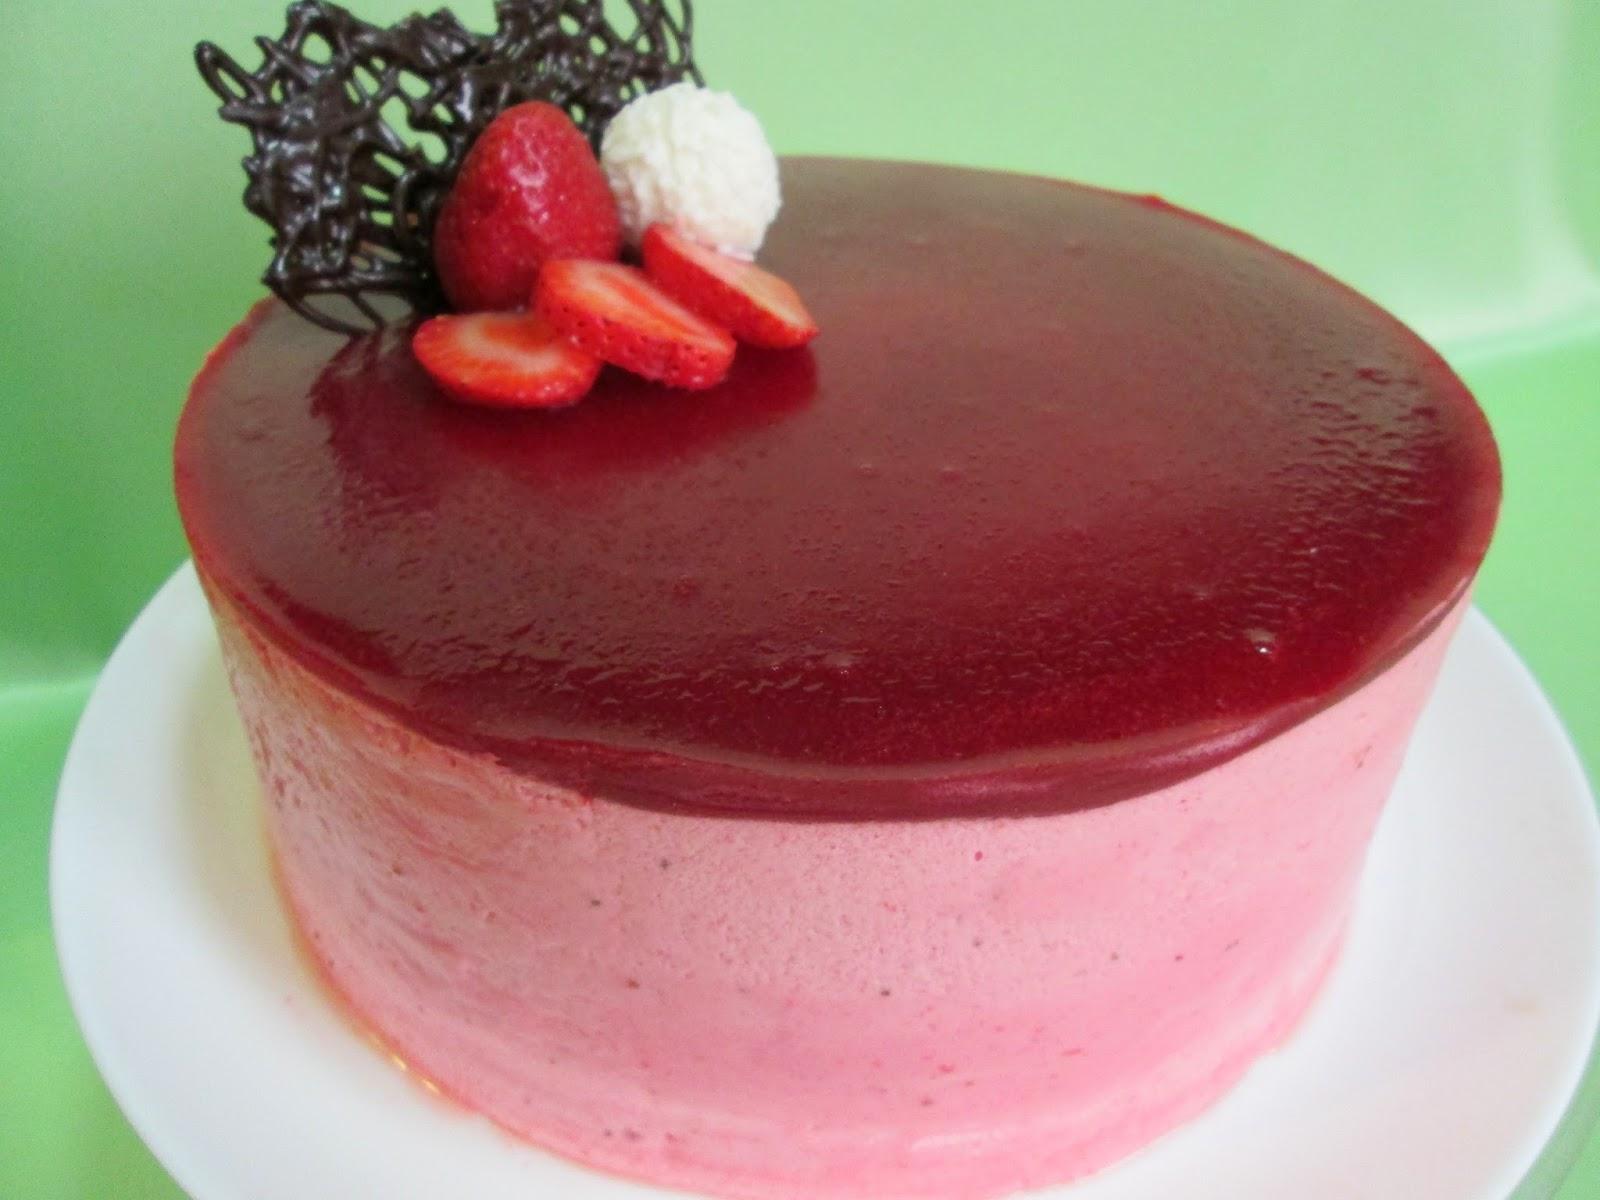 Merengue y fresa tarta mousse de fresas y yogurt - Mouse de yogurt ...